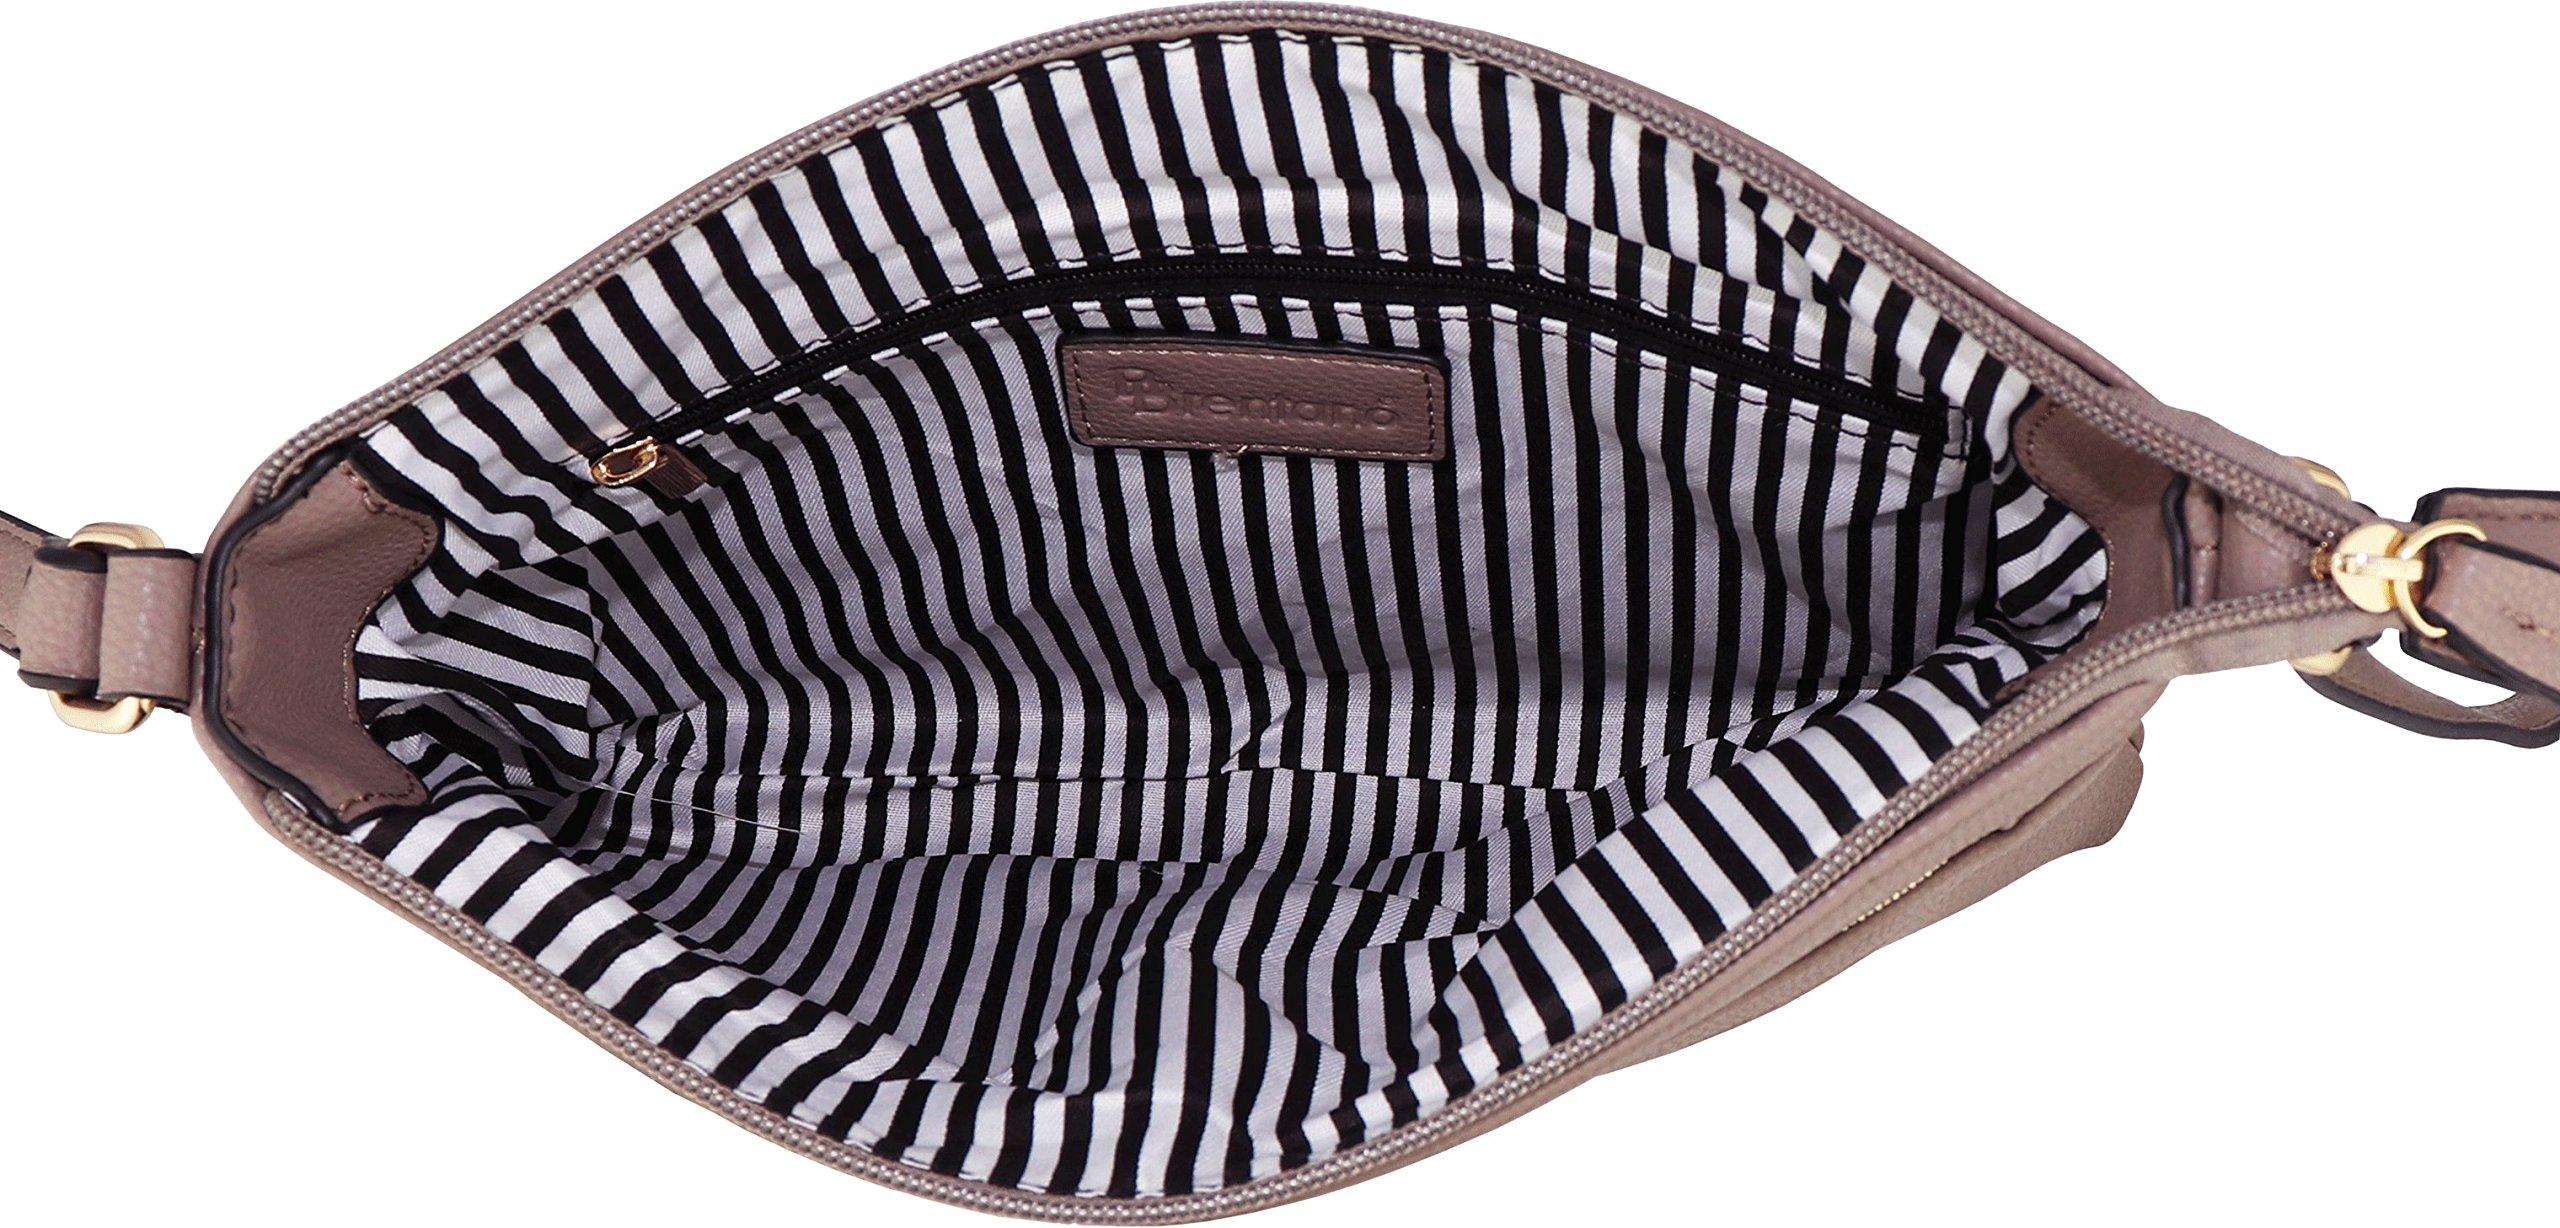 B BRENTANO Vegan Multi-Zipper Crossbody Handbag Purse with Tassel Accents (Nude 1) by B BRENTANO (Image #6)